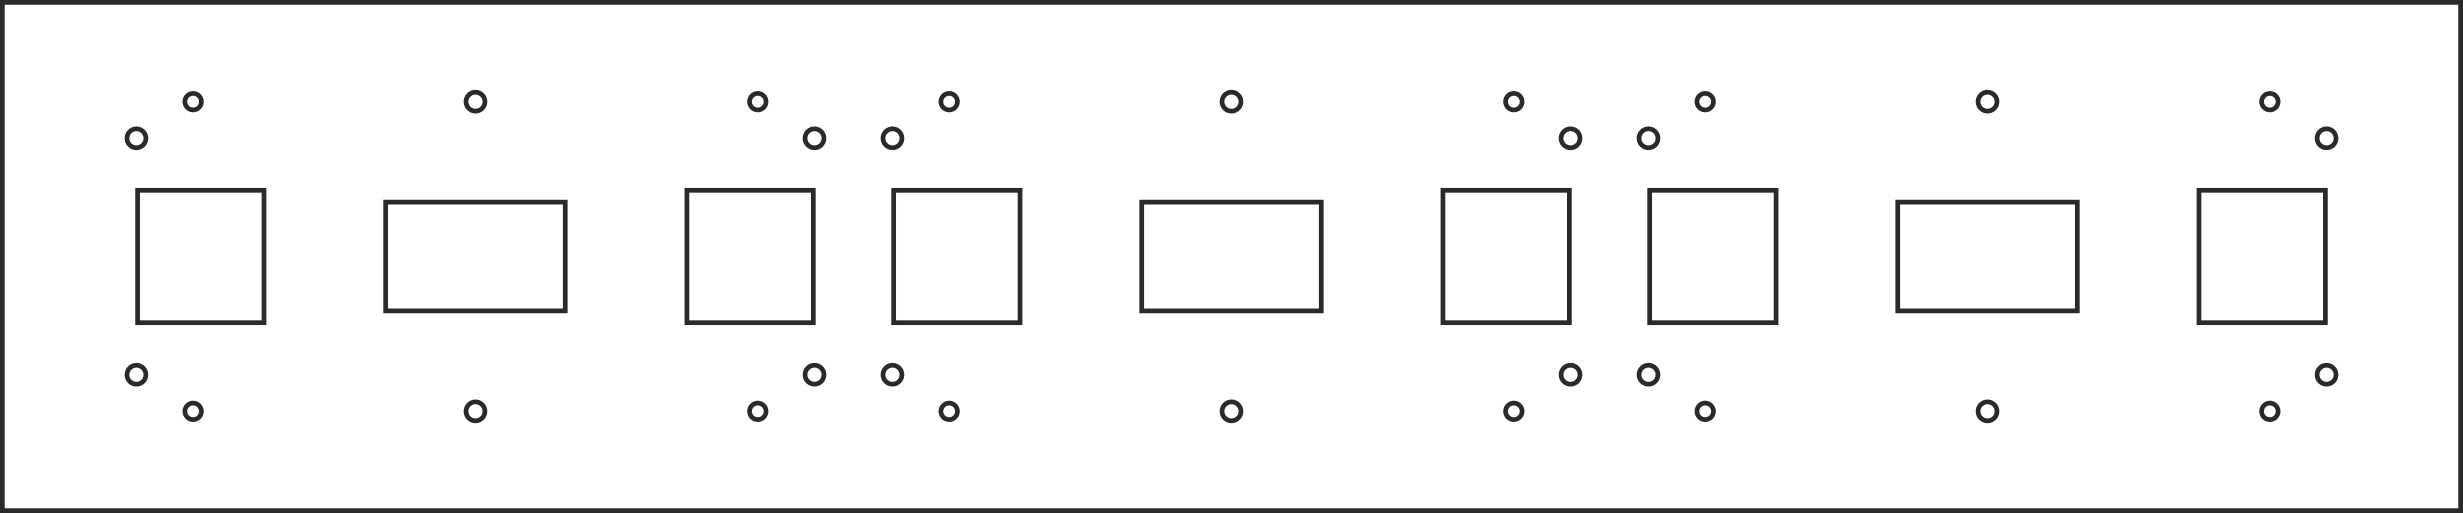 Панель для табло бегущая строка